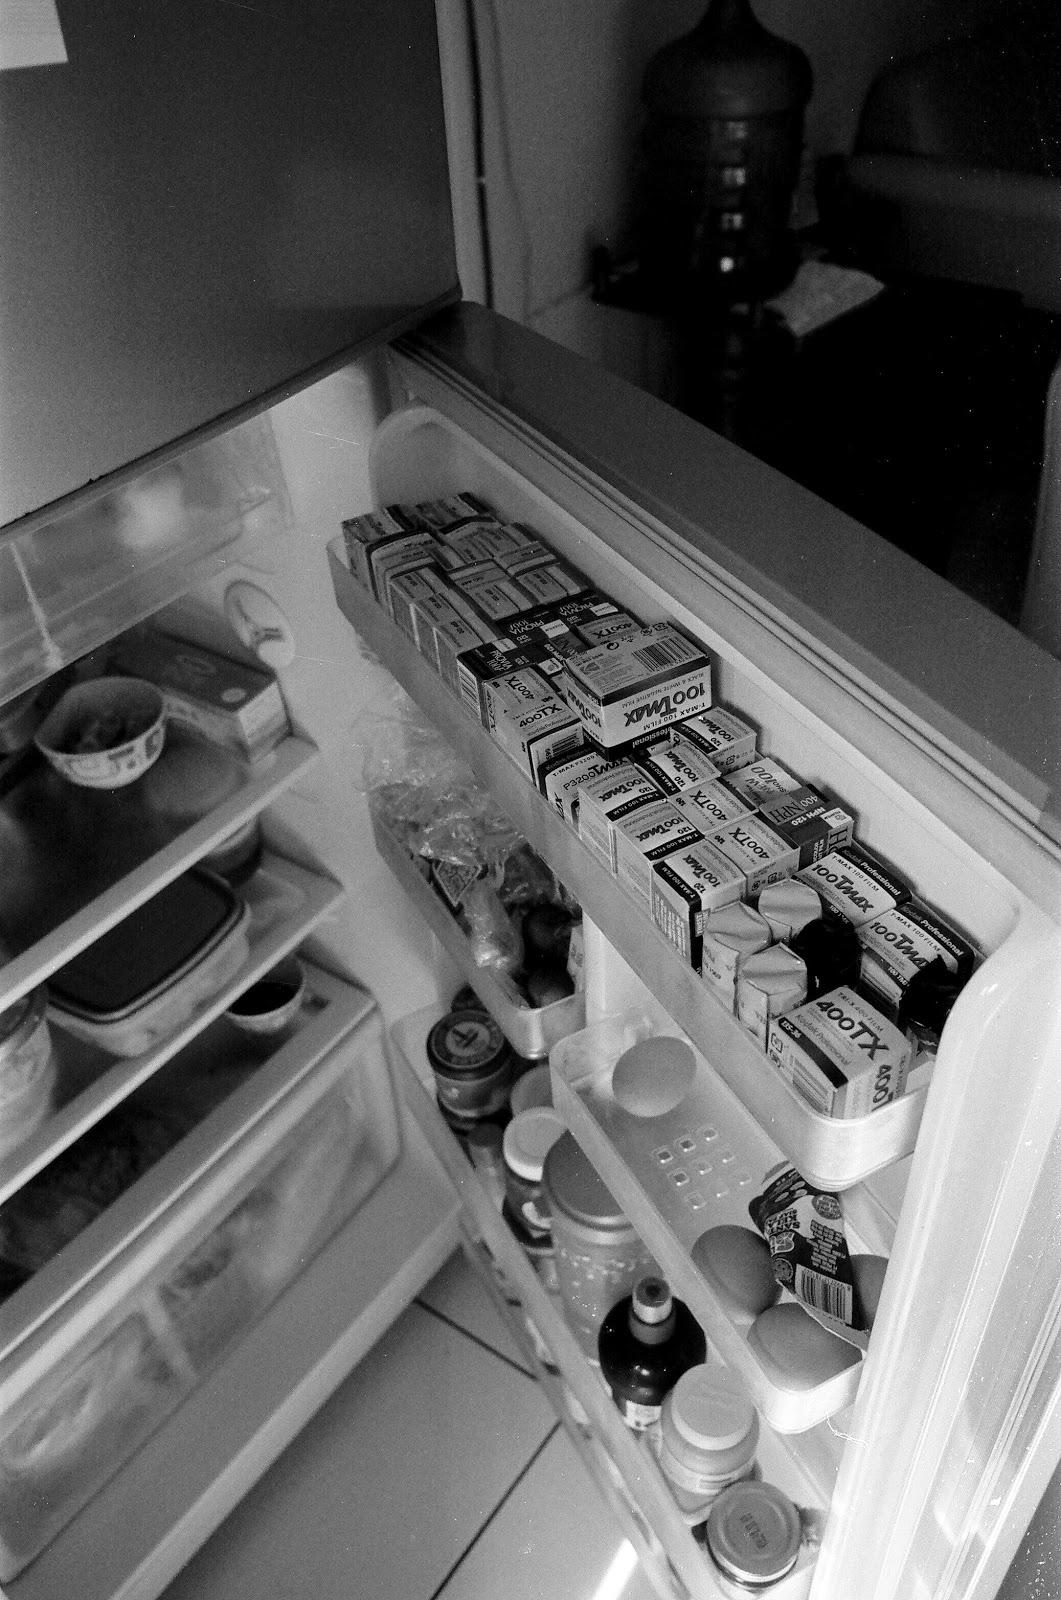 Used Rv Refrigerator For Where